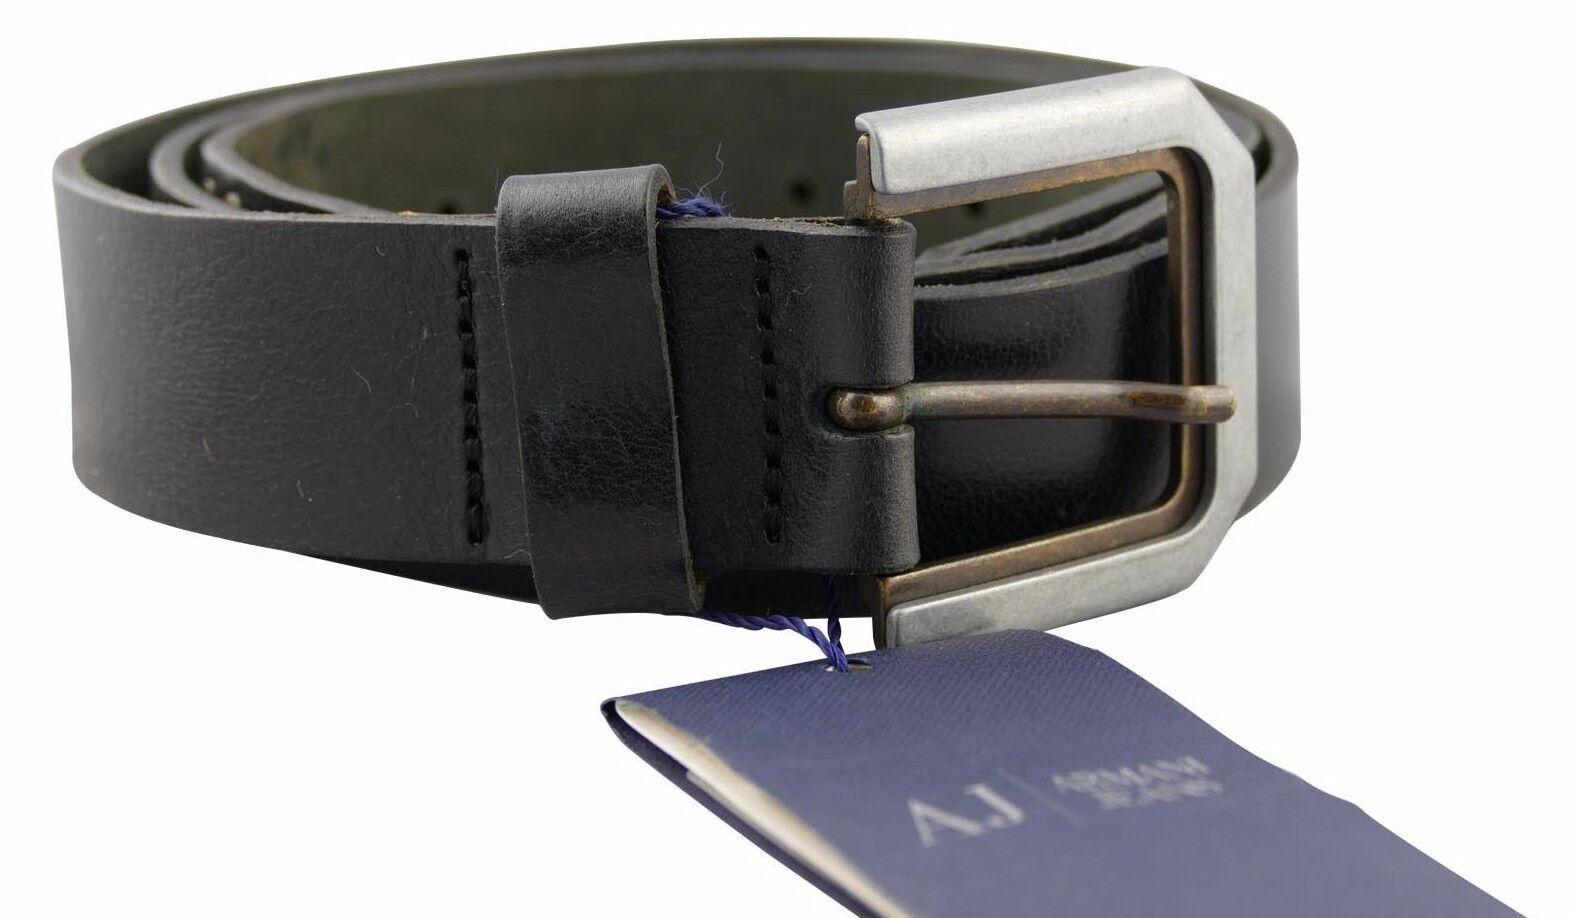 Armani Jeans Schwarz Ledergürtel mit Logo Am Gürtel Retro Hergestellt IN Italien